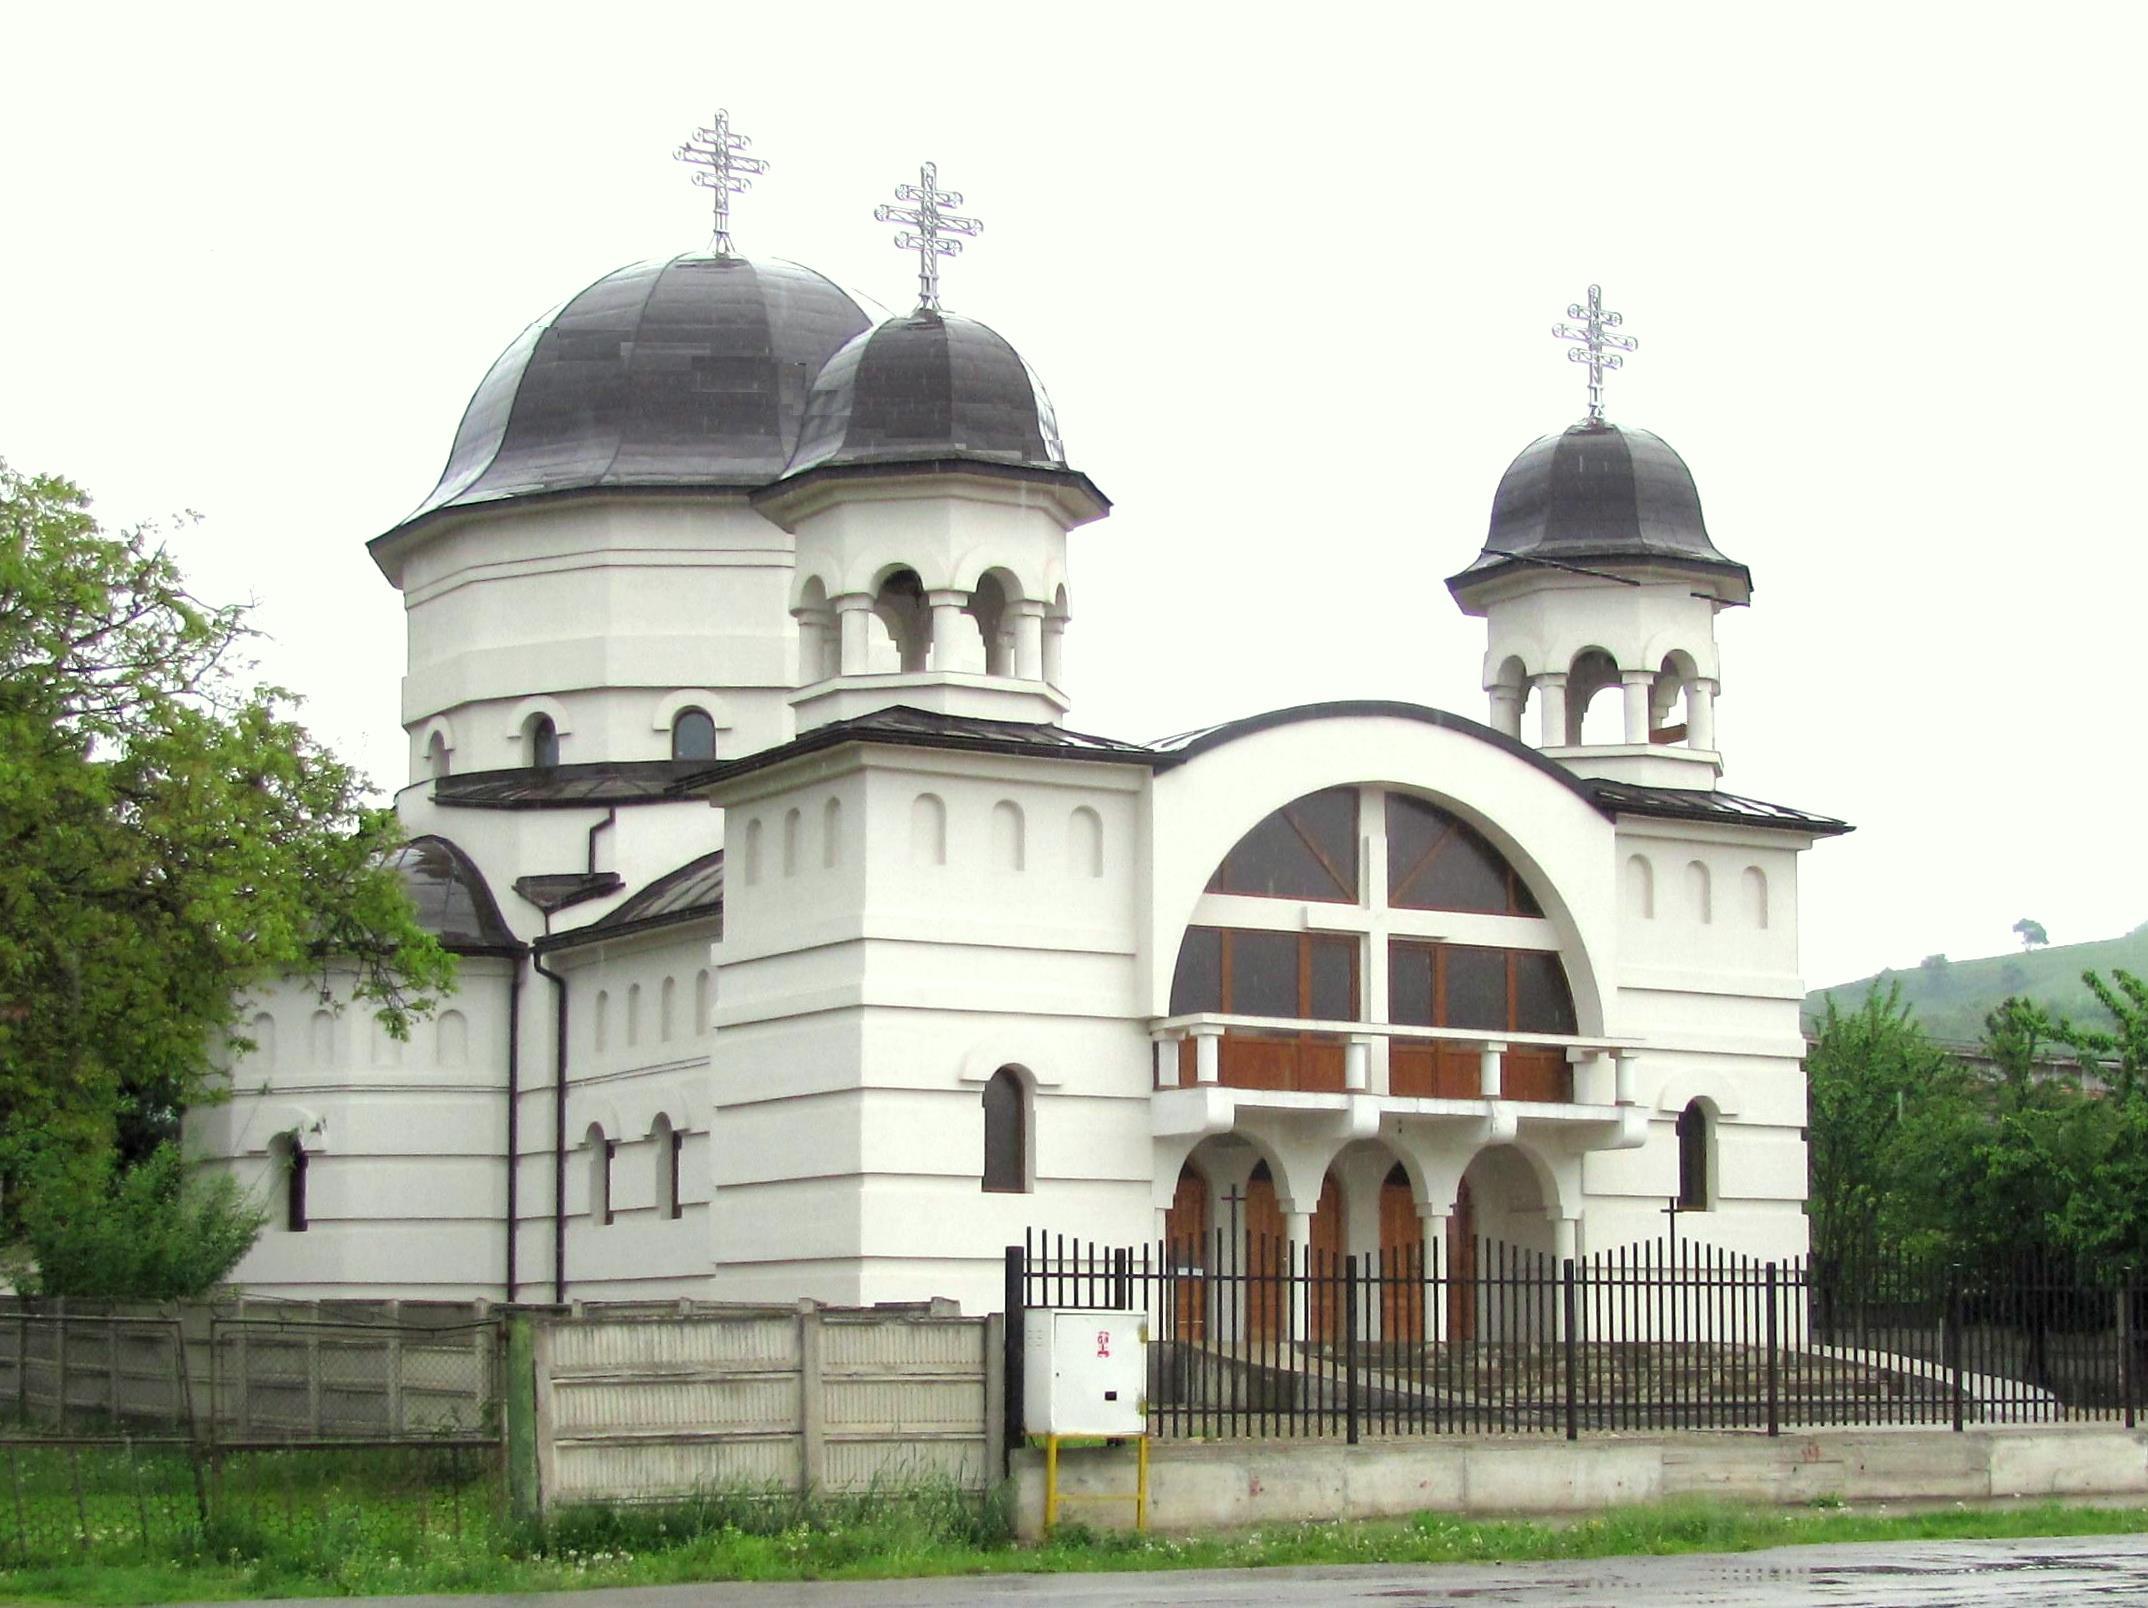 http://upload.wikimedia.org/wikipedia/commons/1/19/Ocna_Mures_Biserica_Ortodoxa_Noua.jpg